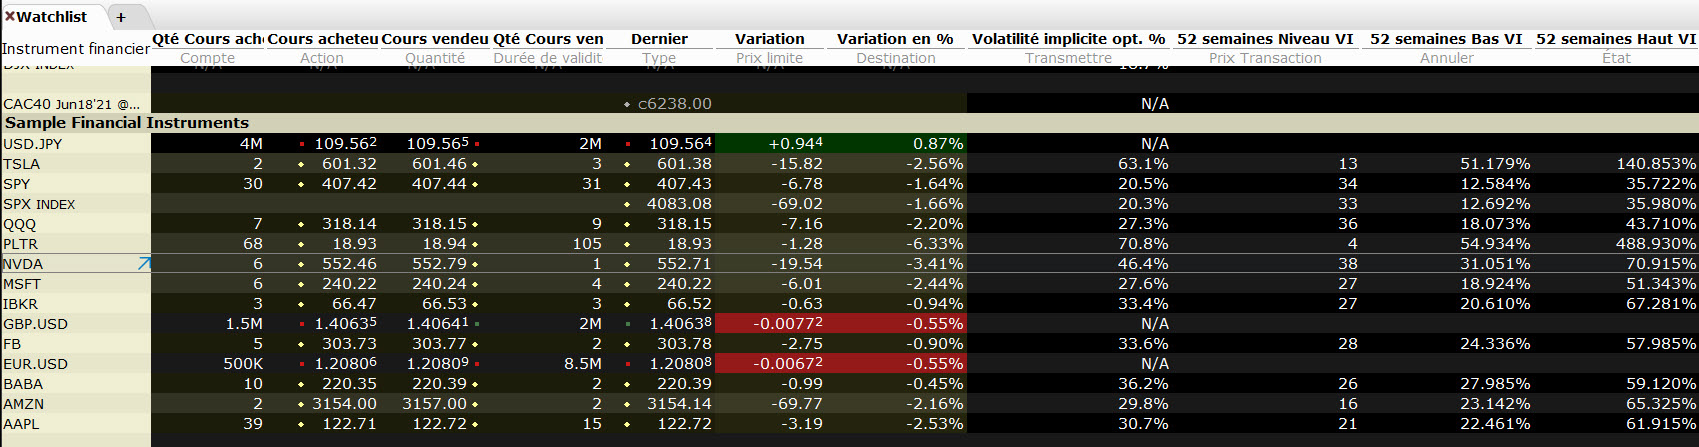 bull put spread - vertical bull put spread - tableau volatilité implicite